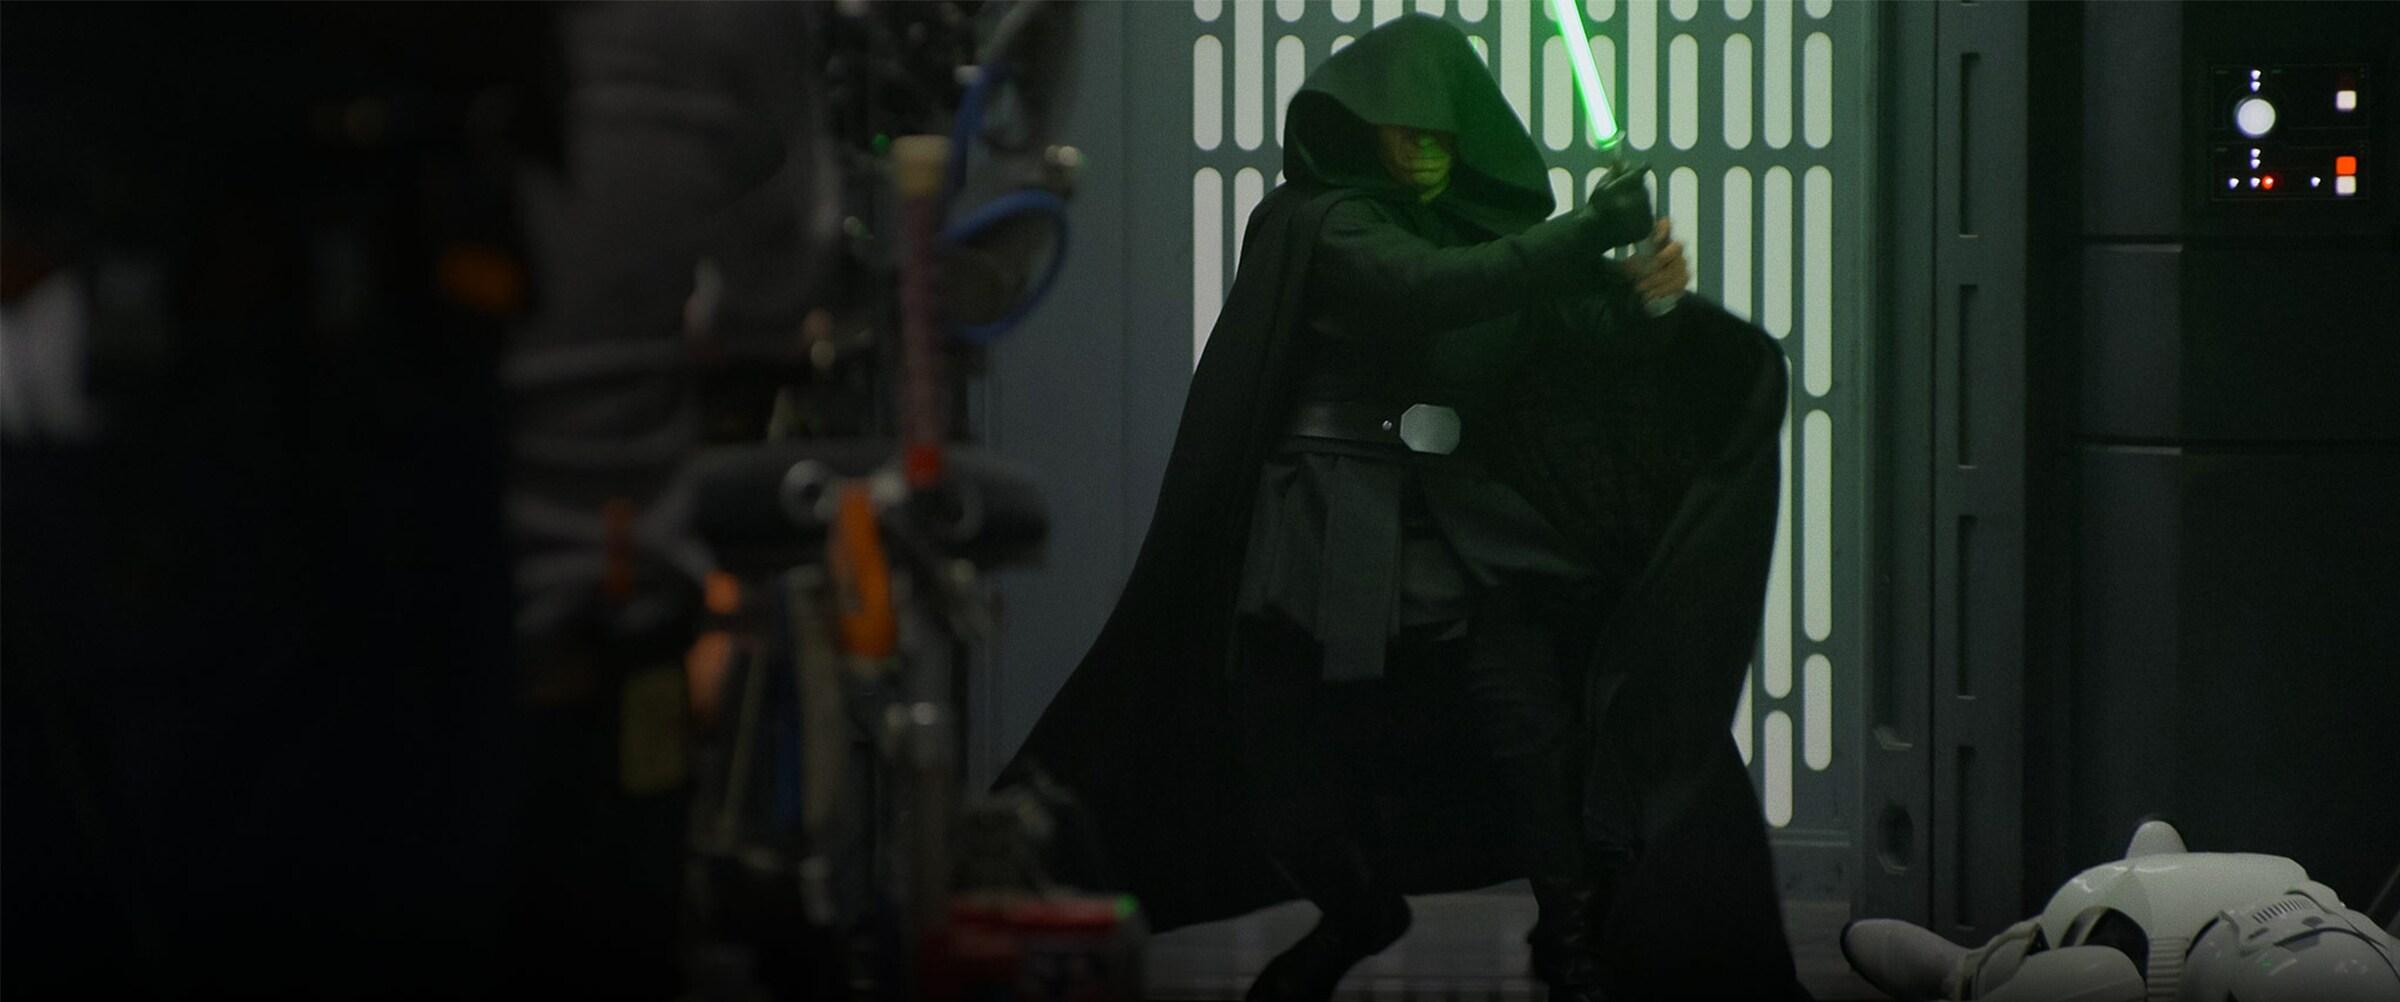 Disney Gallery: Star Wars: The Mandalorian | Now streaming on Disney+